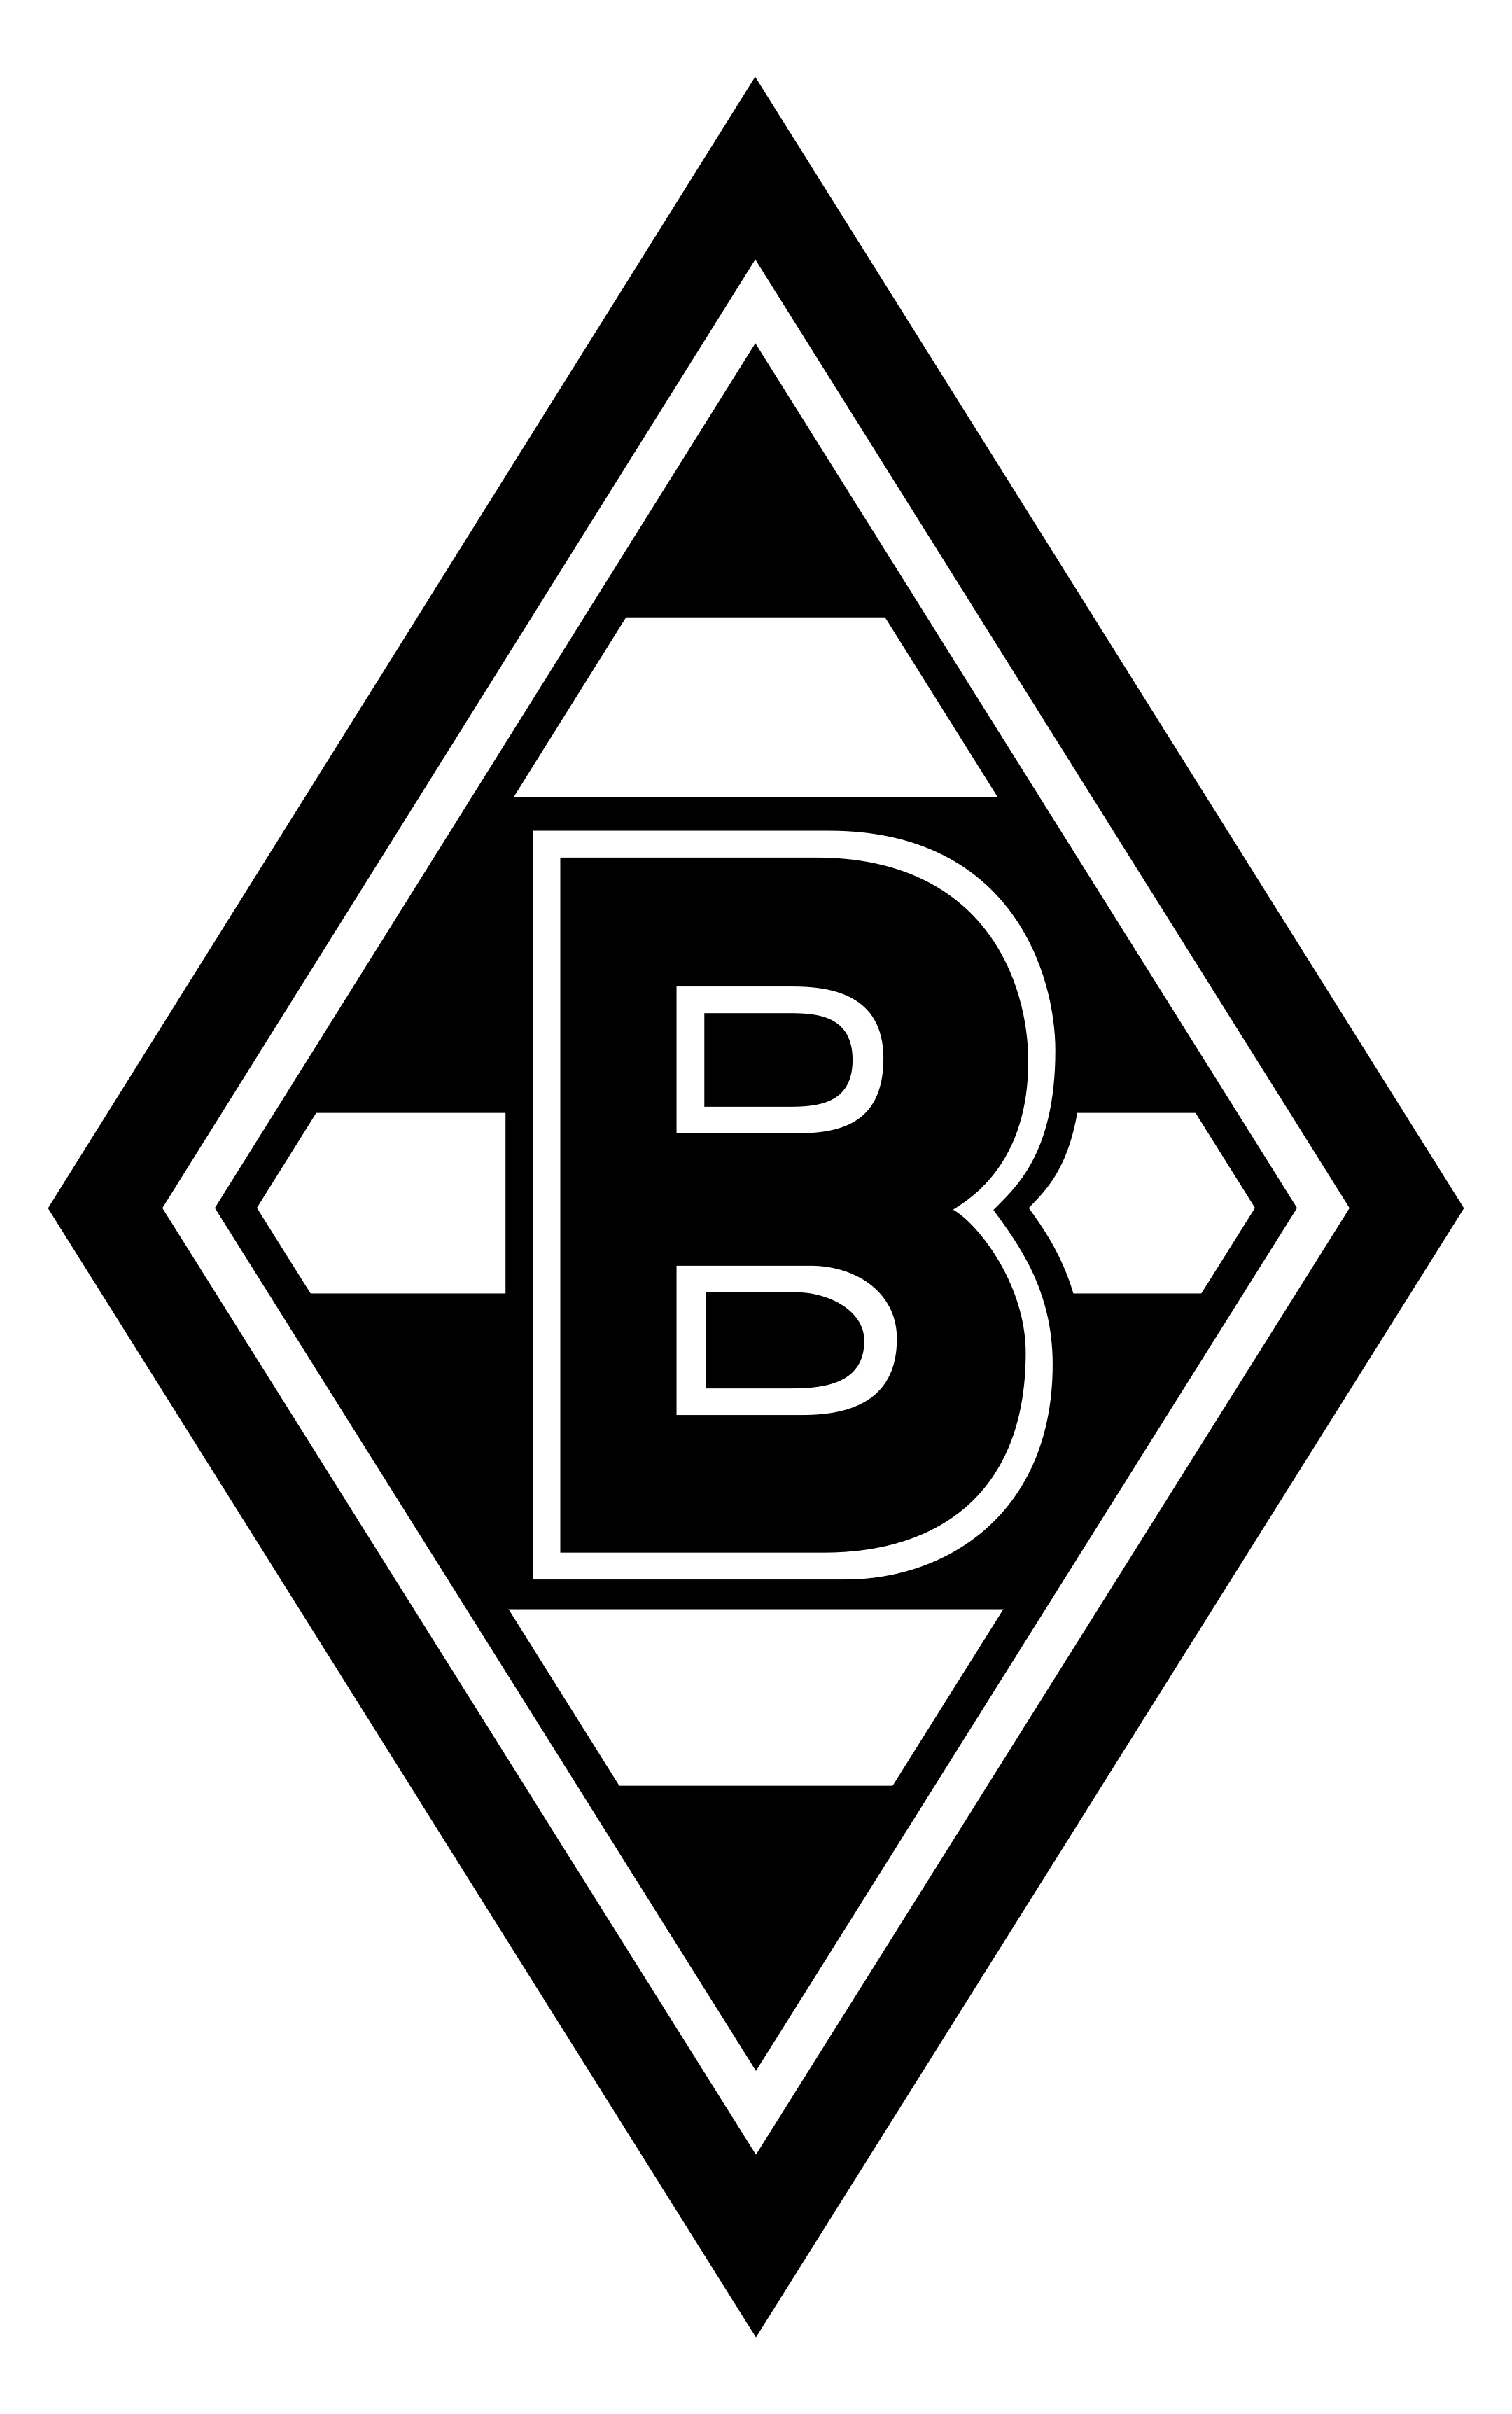 borussia monchengladbach logo 1 - Borussia Mönchengladbach Logo